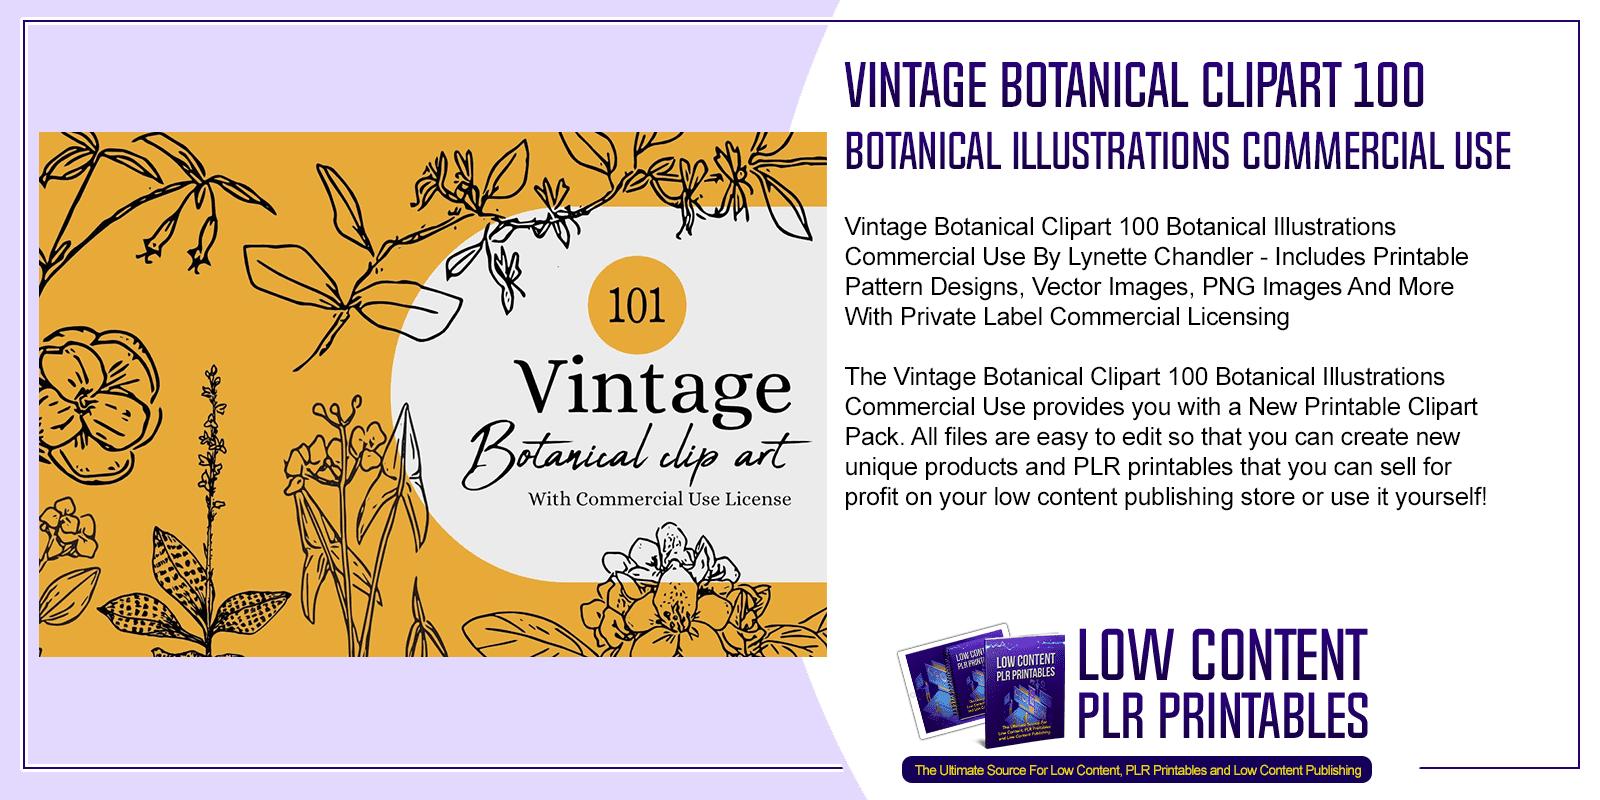 Vintage Botanical Clipart 100 Botanical Illustrations Commercial Use